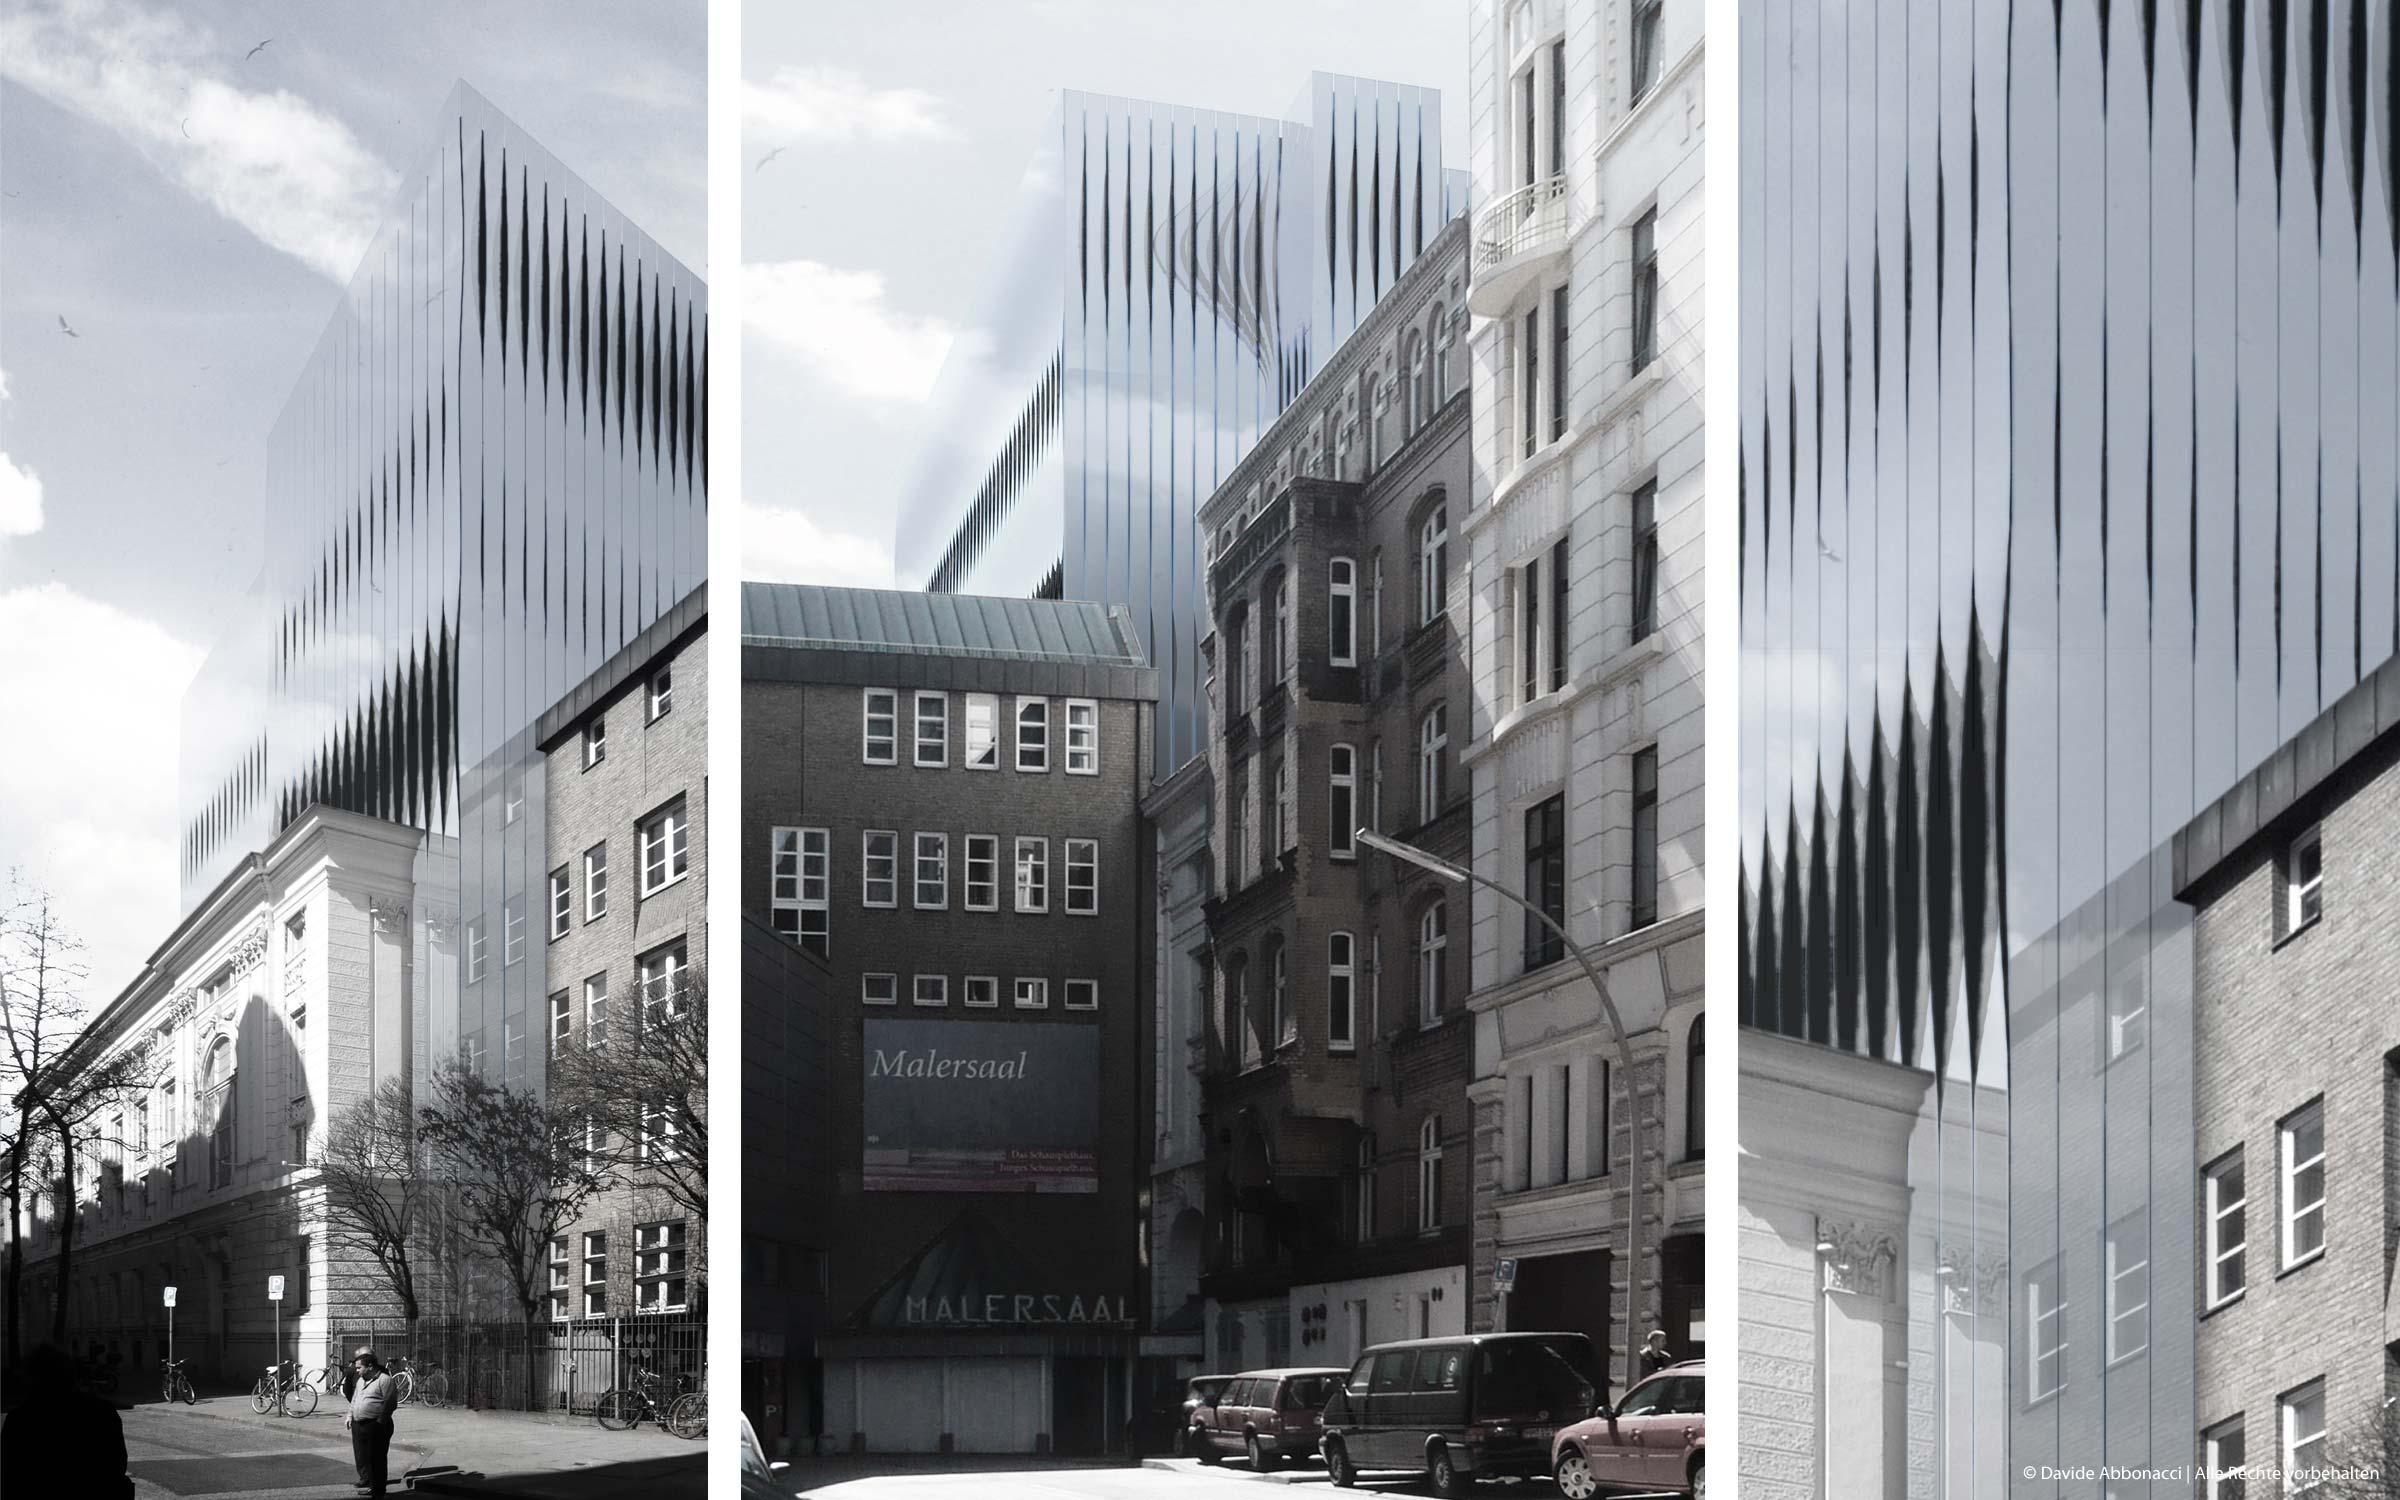 au enr ume davide abbonacci 3d visualisierung berlin. Black Bedroom Furniture Sets. Home Design Ideas